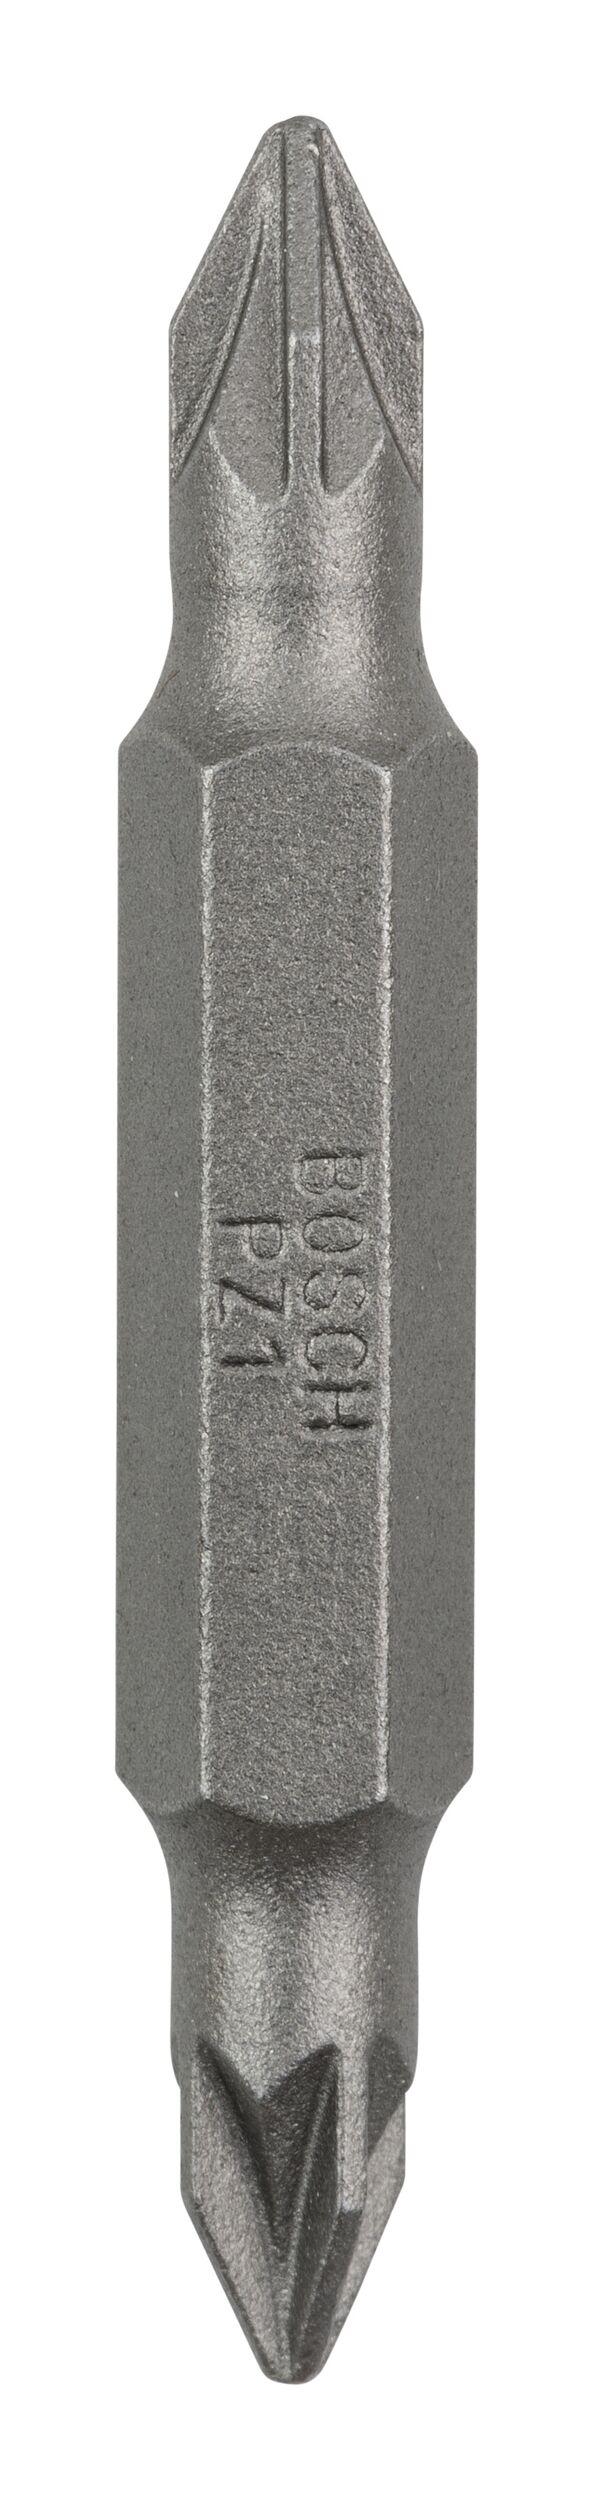 Bosch Zubehör Doppelklingenbit PZ1, PZ1, 45 mm - 2607001741 (VPE: 10 Stück)